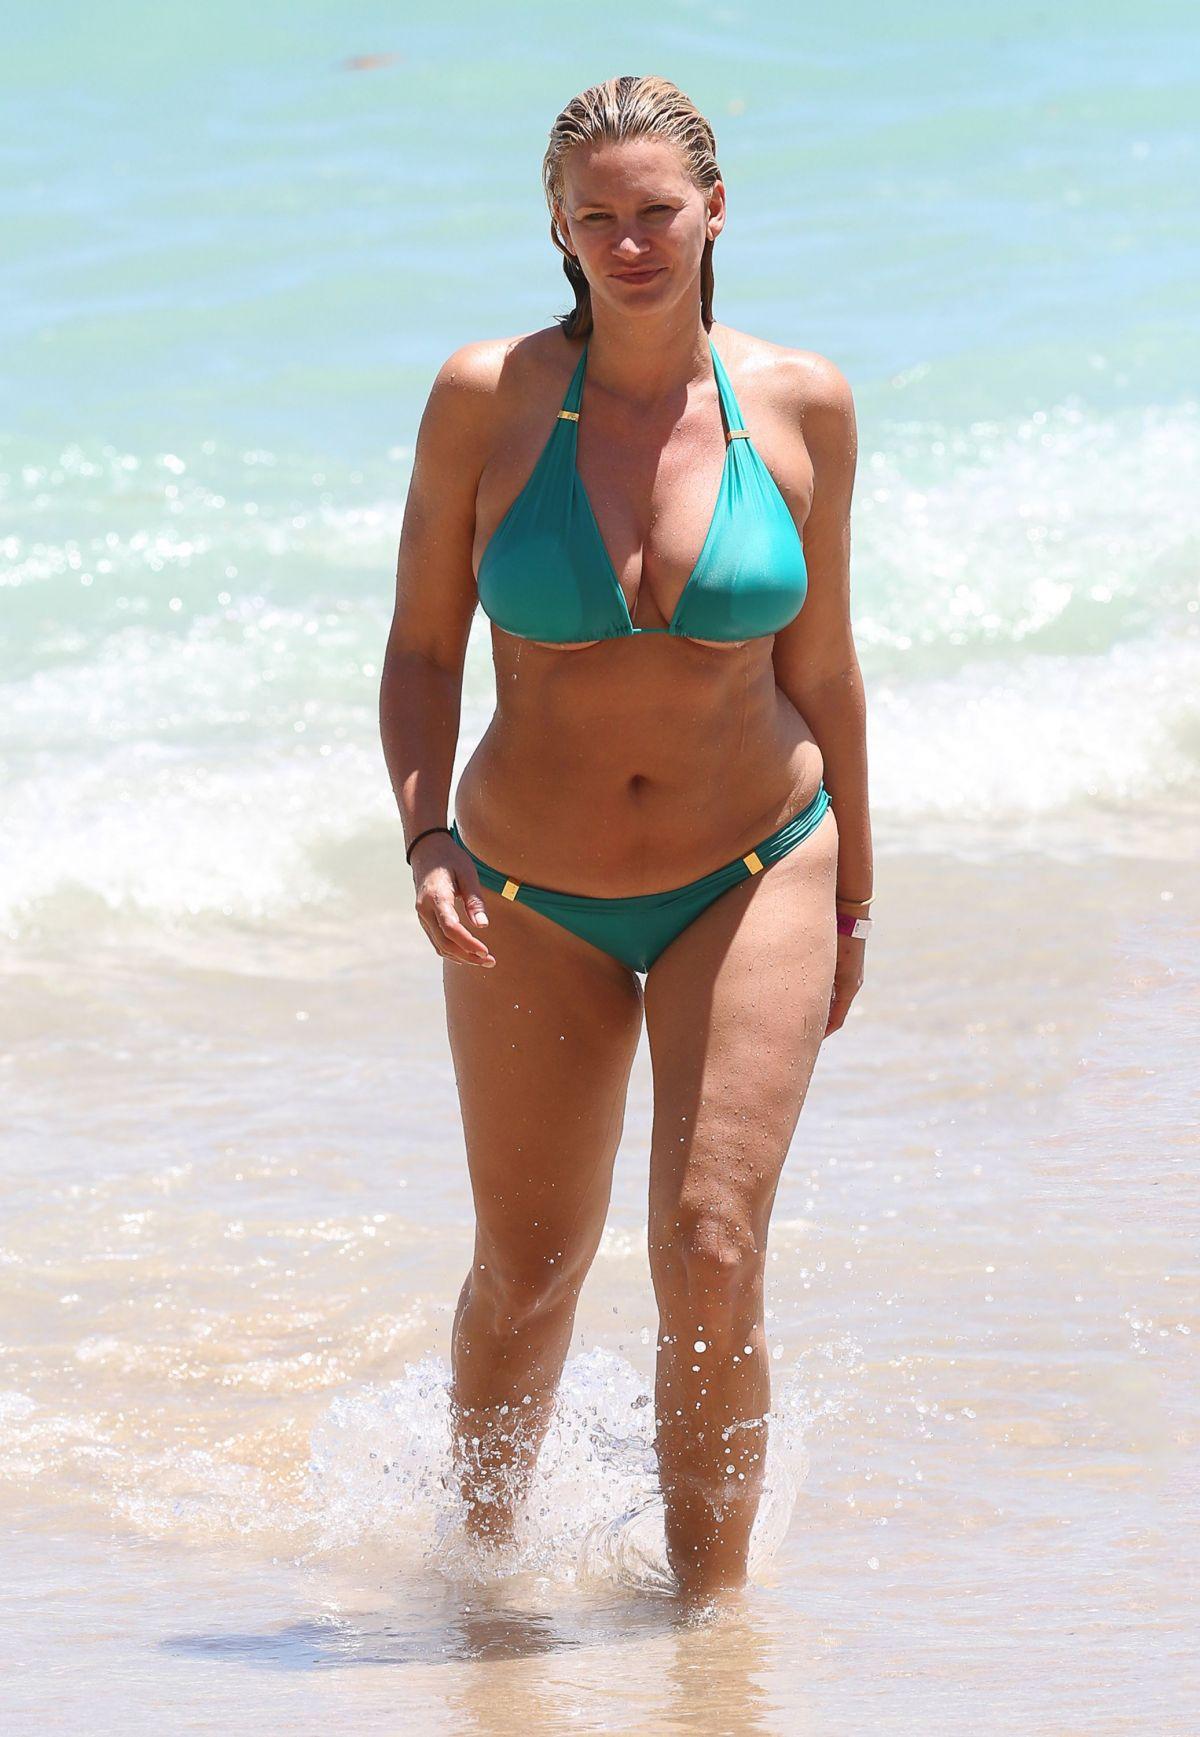 NATASHA HENSTRIDGE in Bikini on the Beach in Hawaii - HawtCelebs